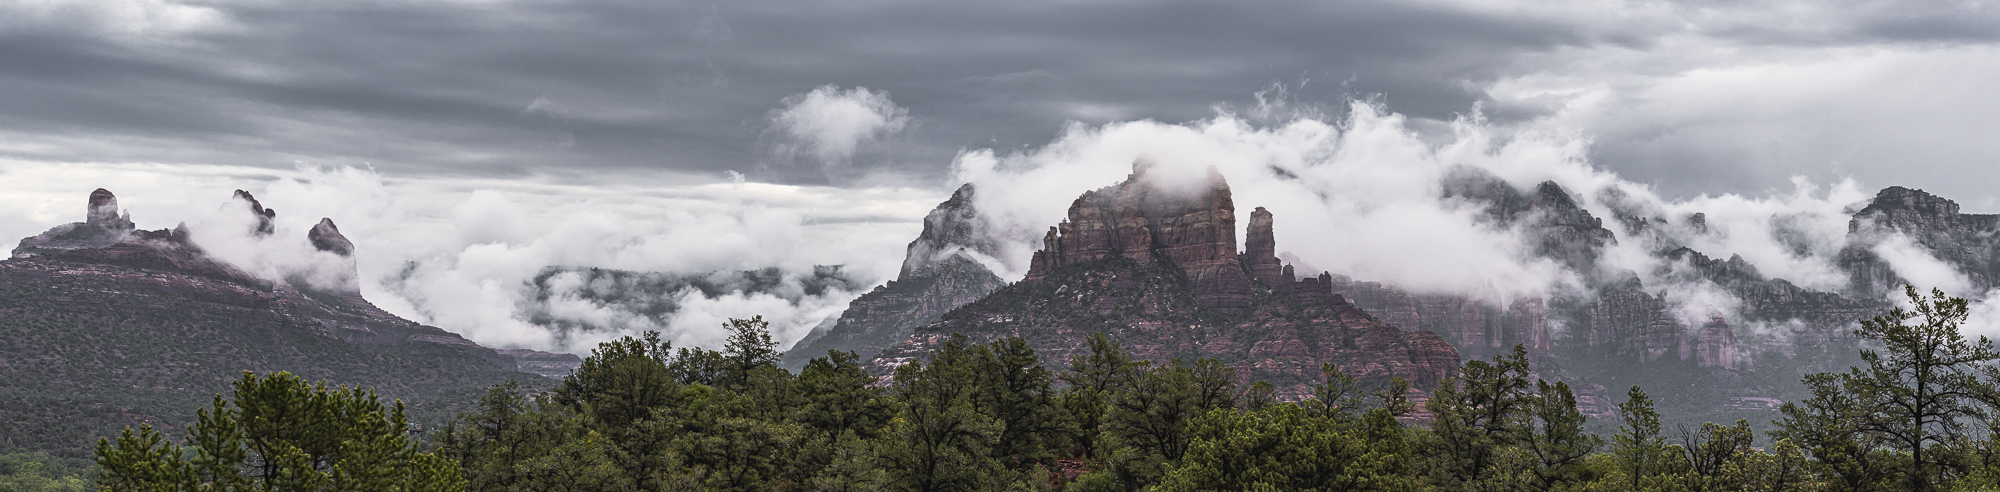 Monsoon Clouds on the Mogollon Rim